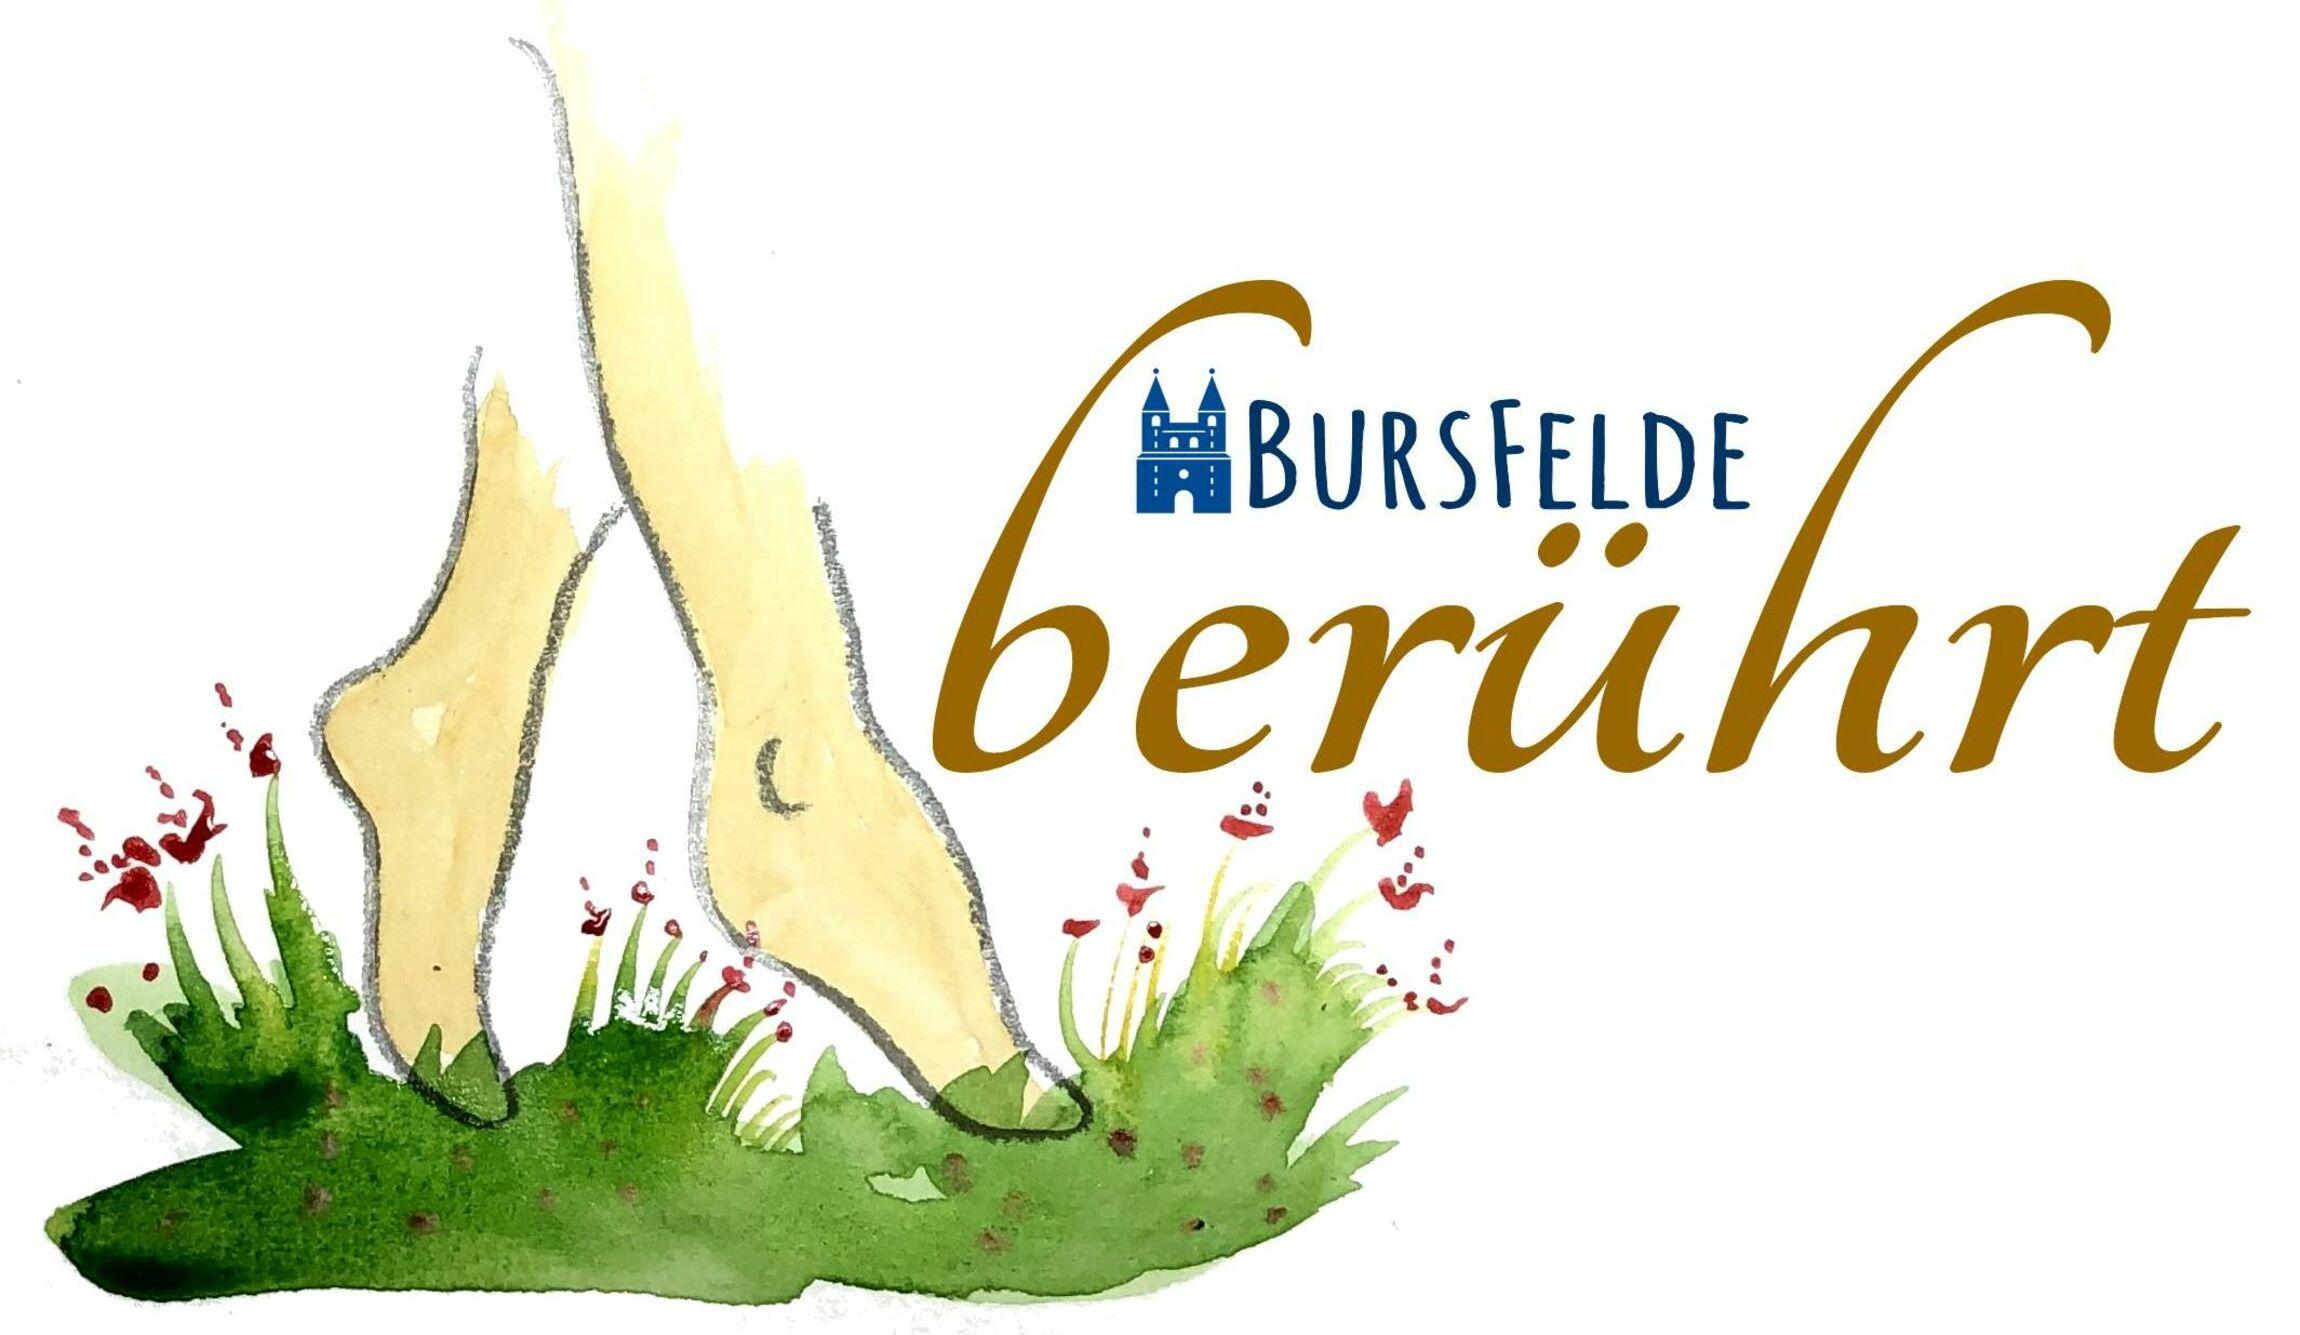 Layout: Klaas Grensemann, Kloster Bursfelde